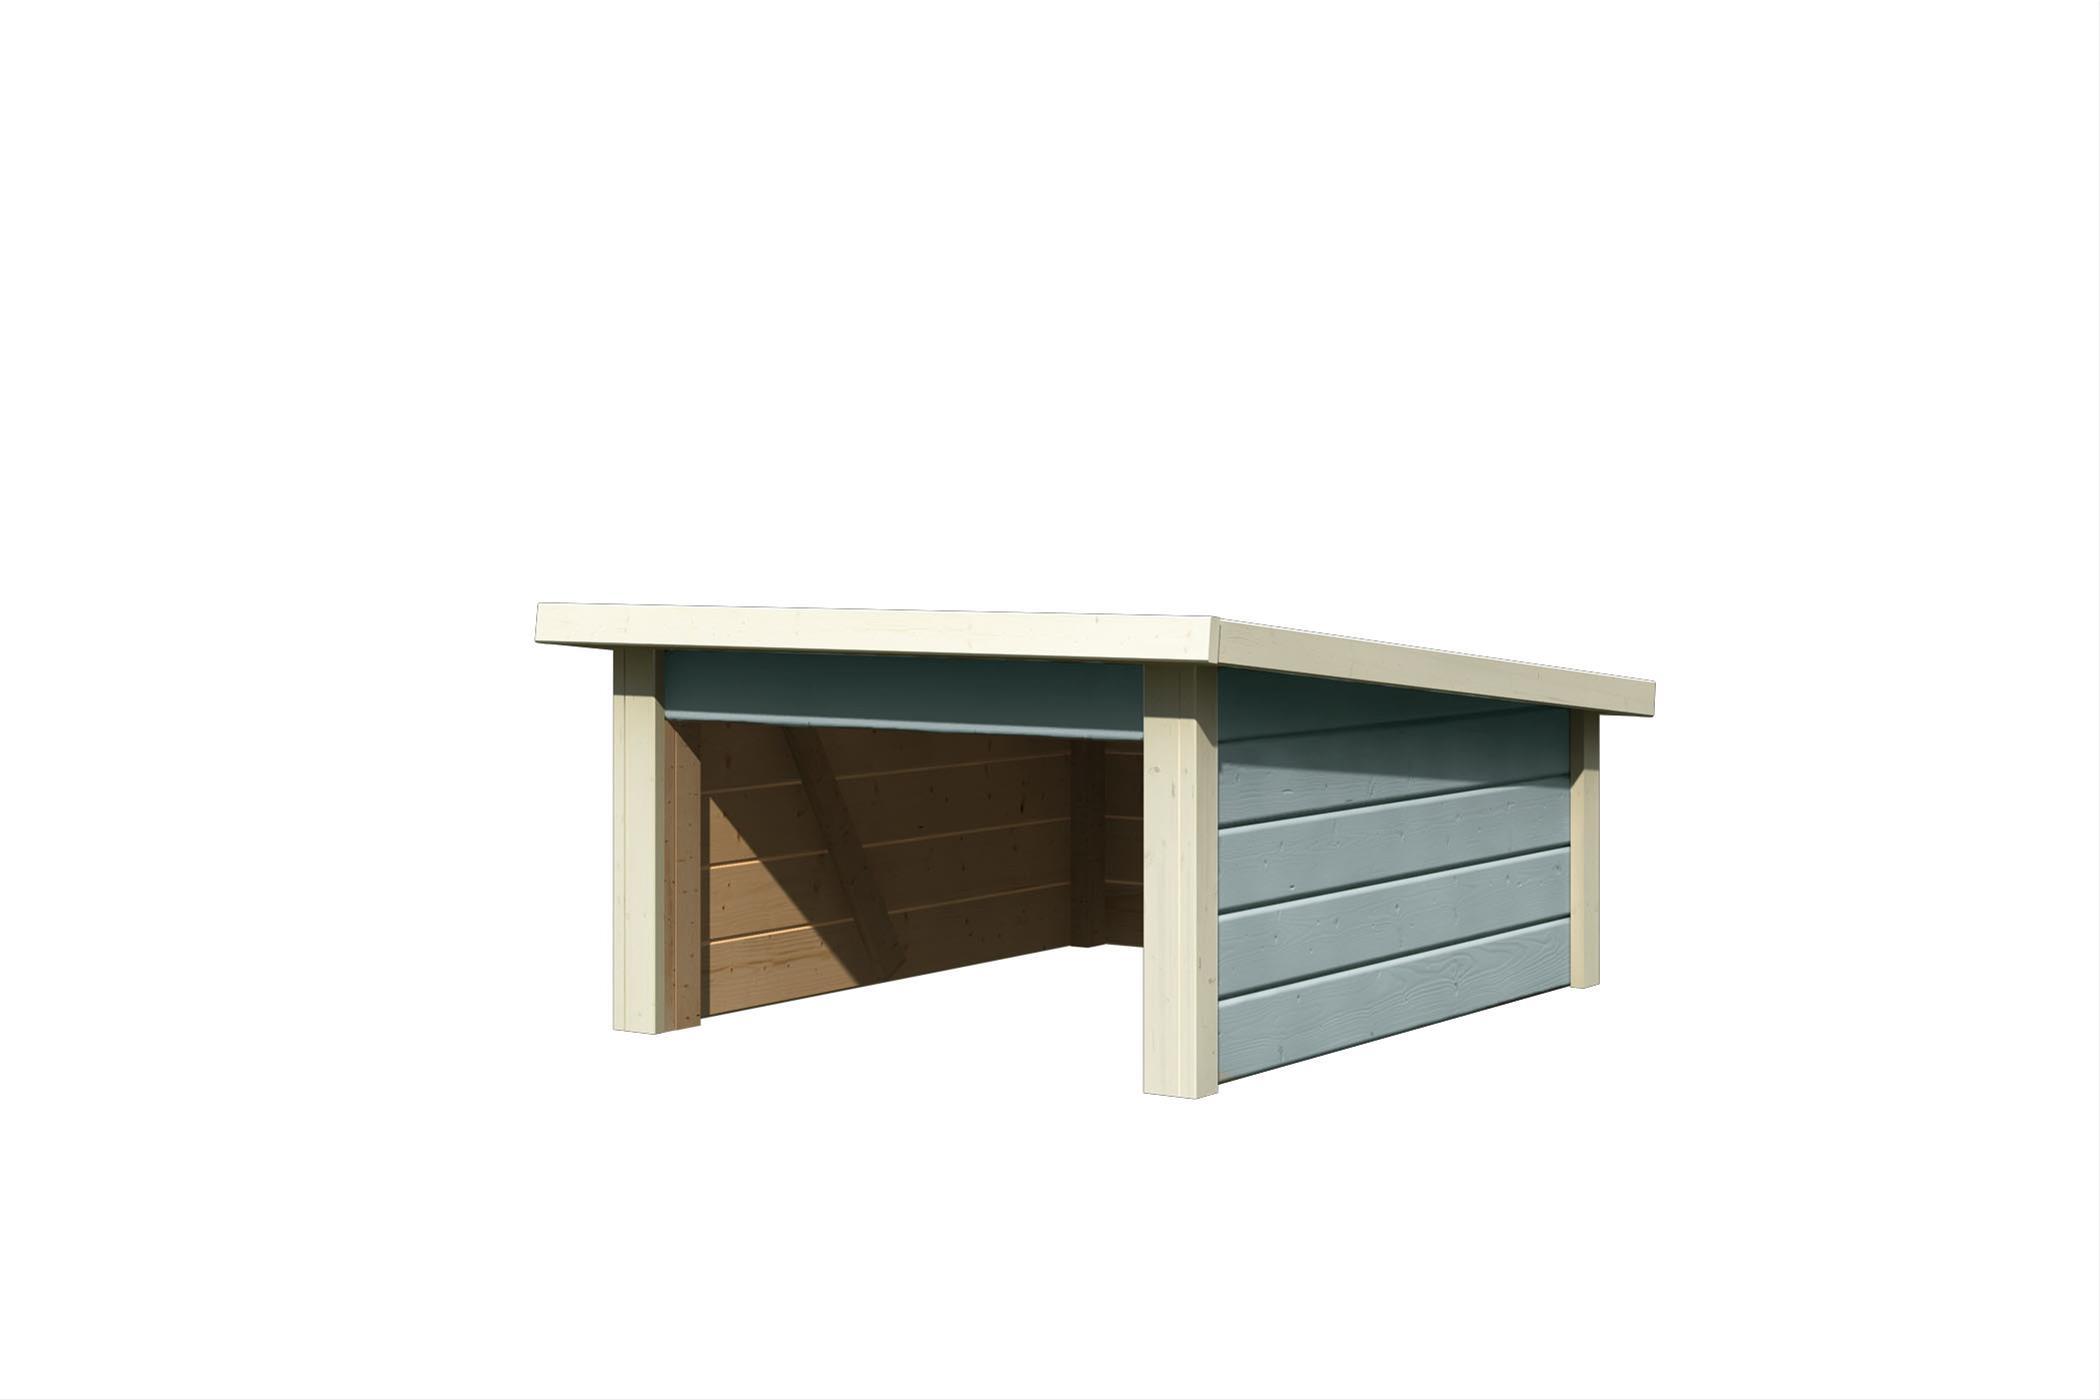 Woodfeeling Mähroboter Haus / Garage 2 seidengrau 79x96x57cm Bild 2